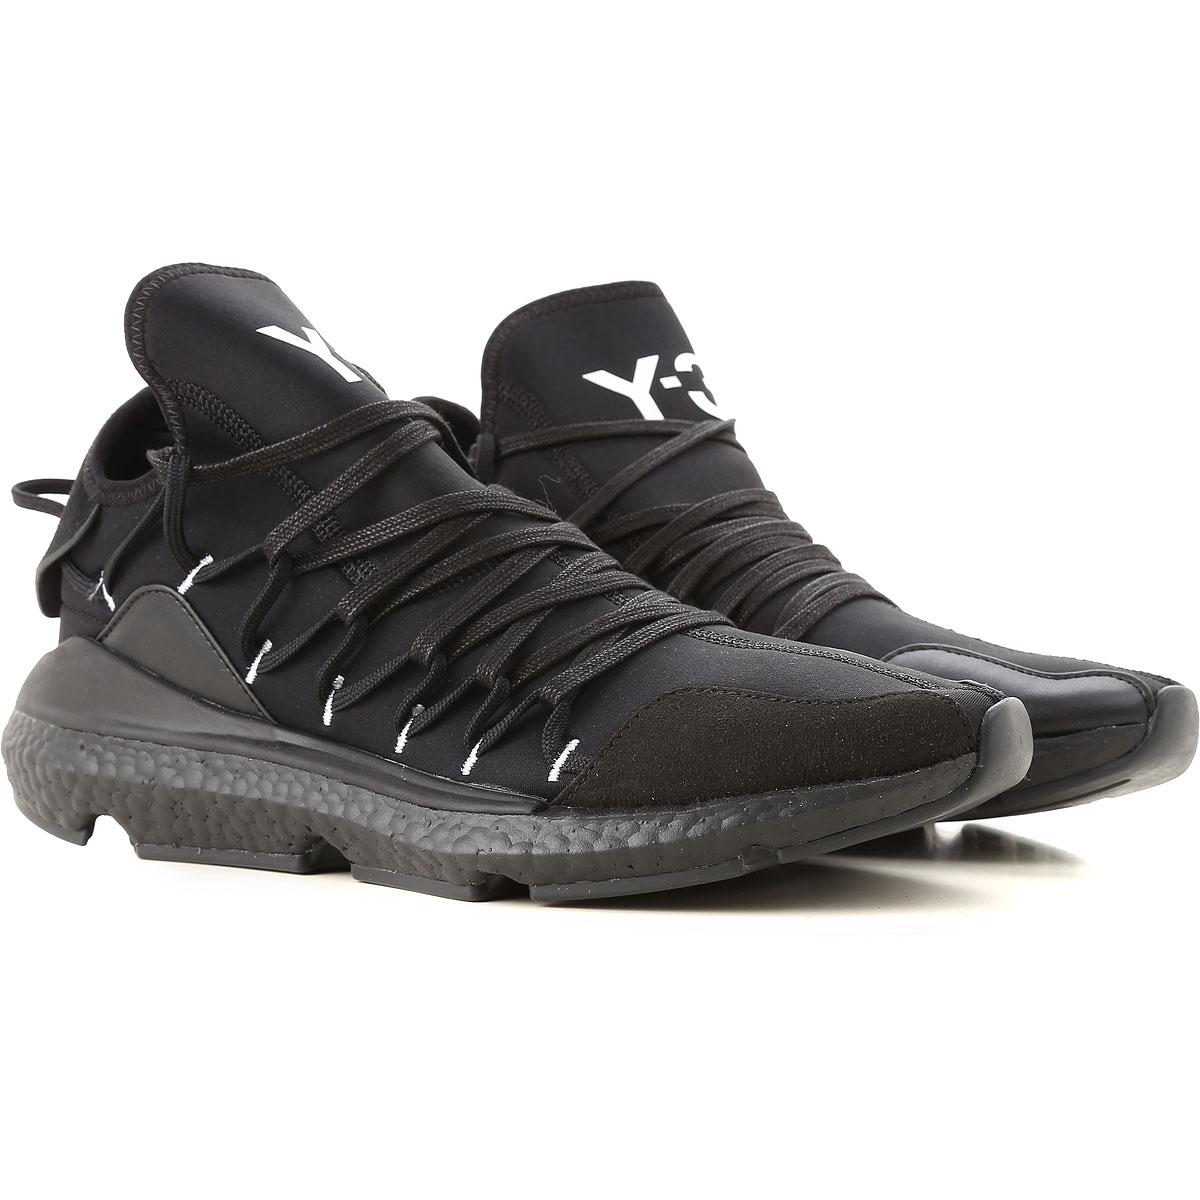 Image of Y3 by Yohji Yamamoto Sneakers for Men, Kusari, Black, Neoprene, 2017, 10 10.5 11 11.5 12 7 7.5 8 8.5 9.5